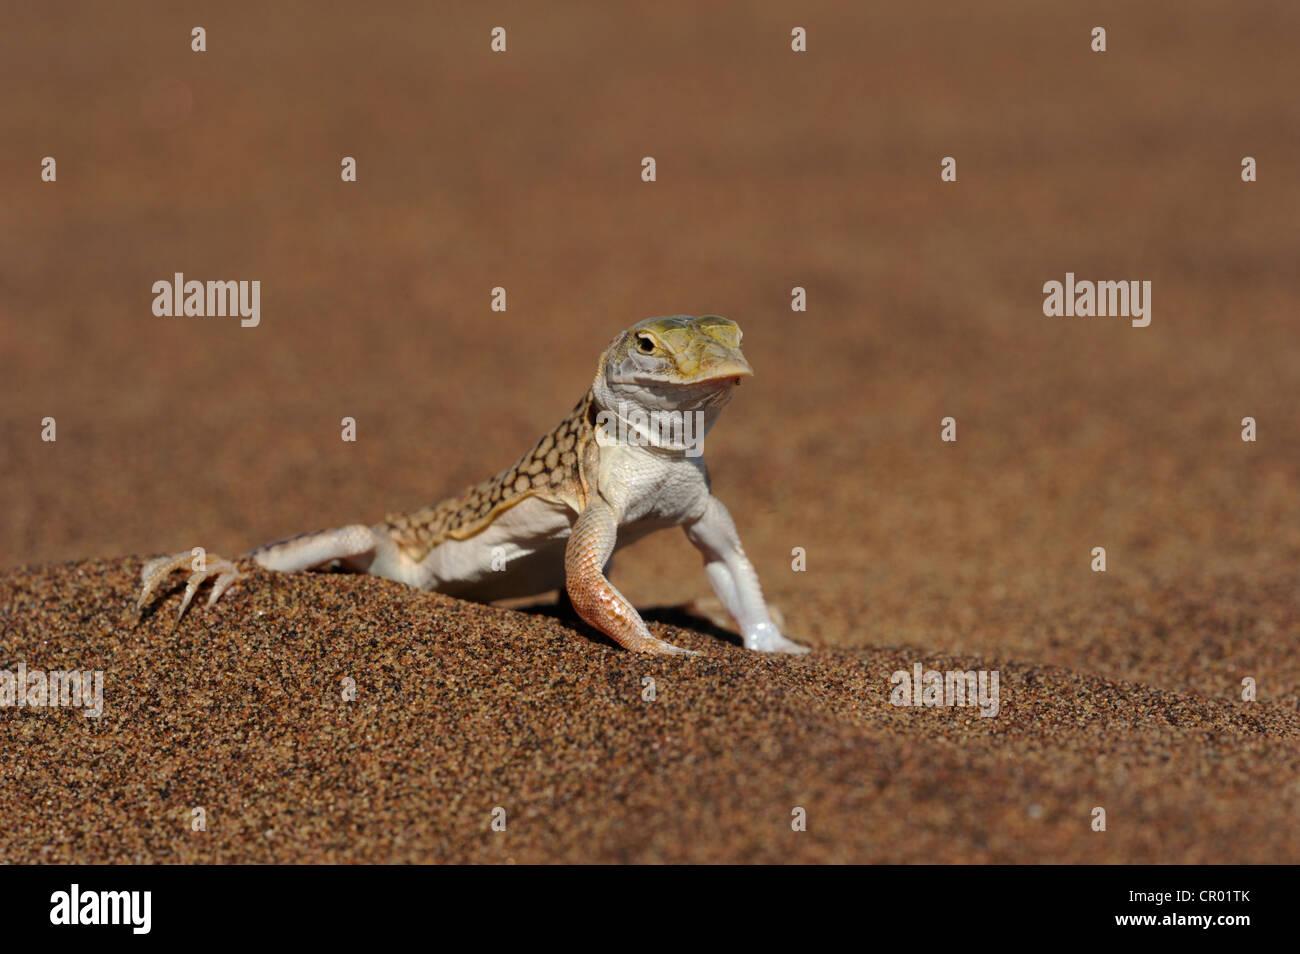 Schaufel snouted Lizard (Meroles Anchietae), Namib-Wüste, namibia Stockbild